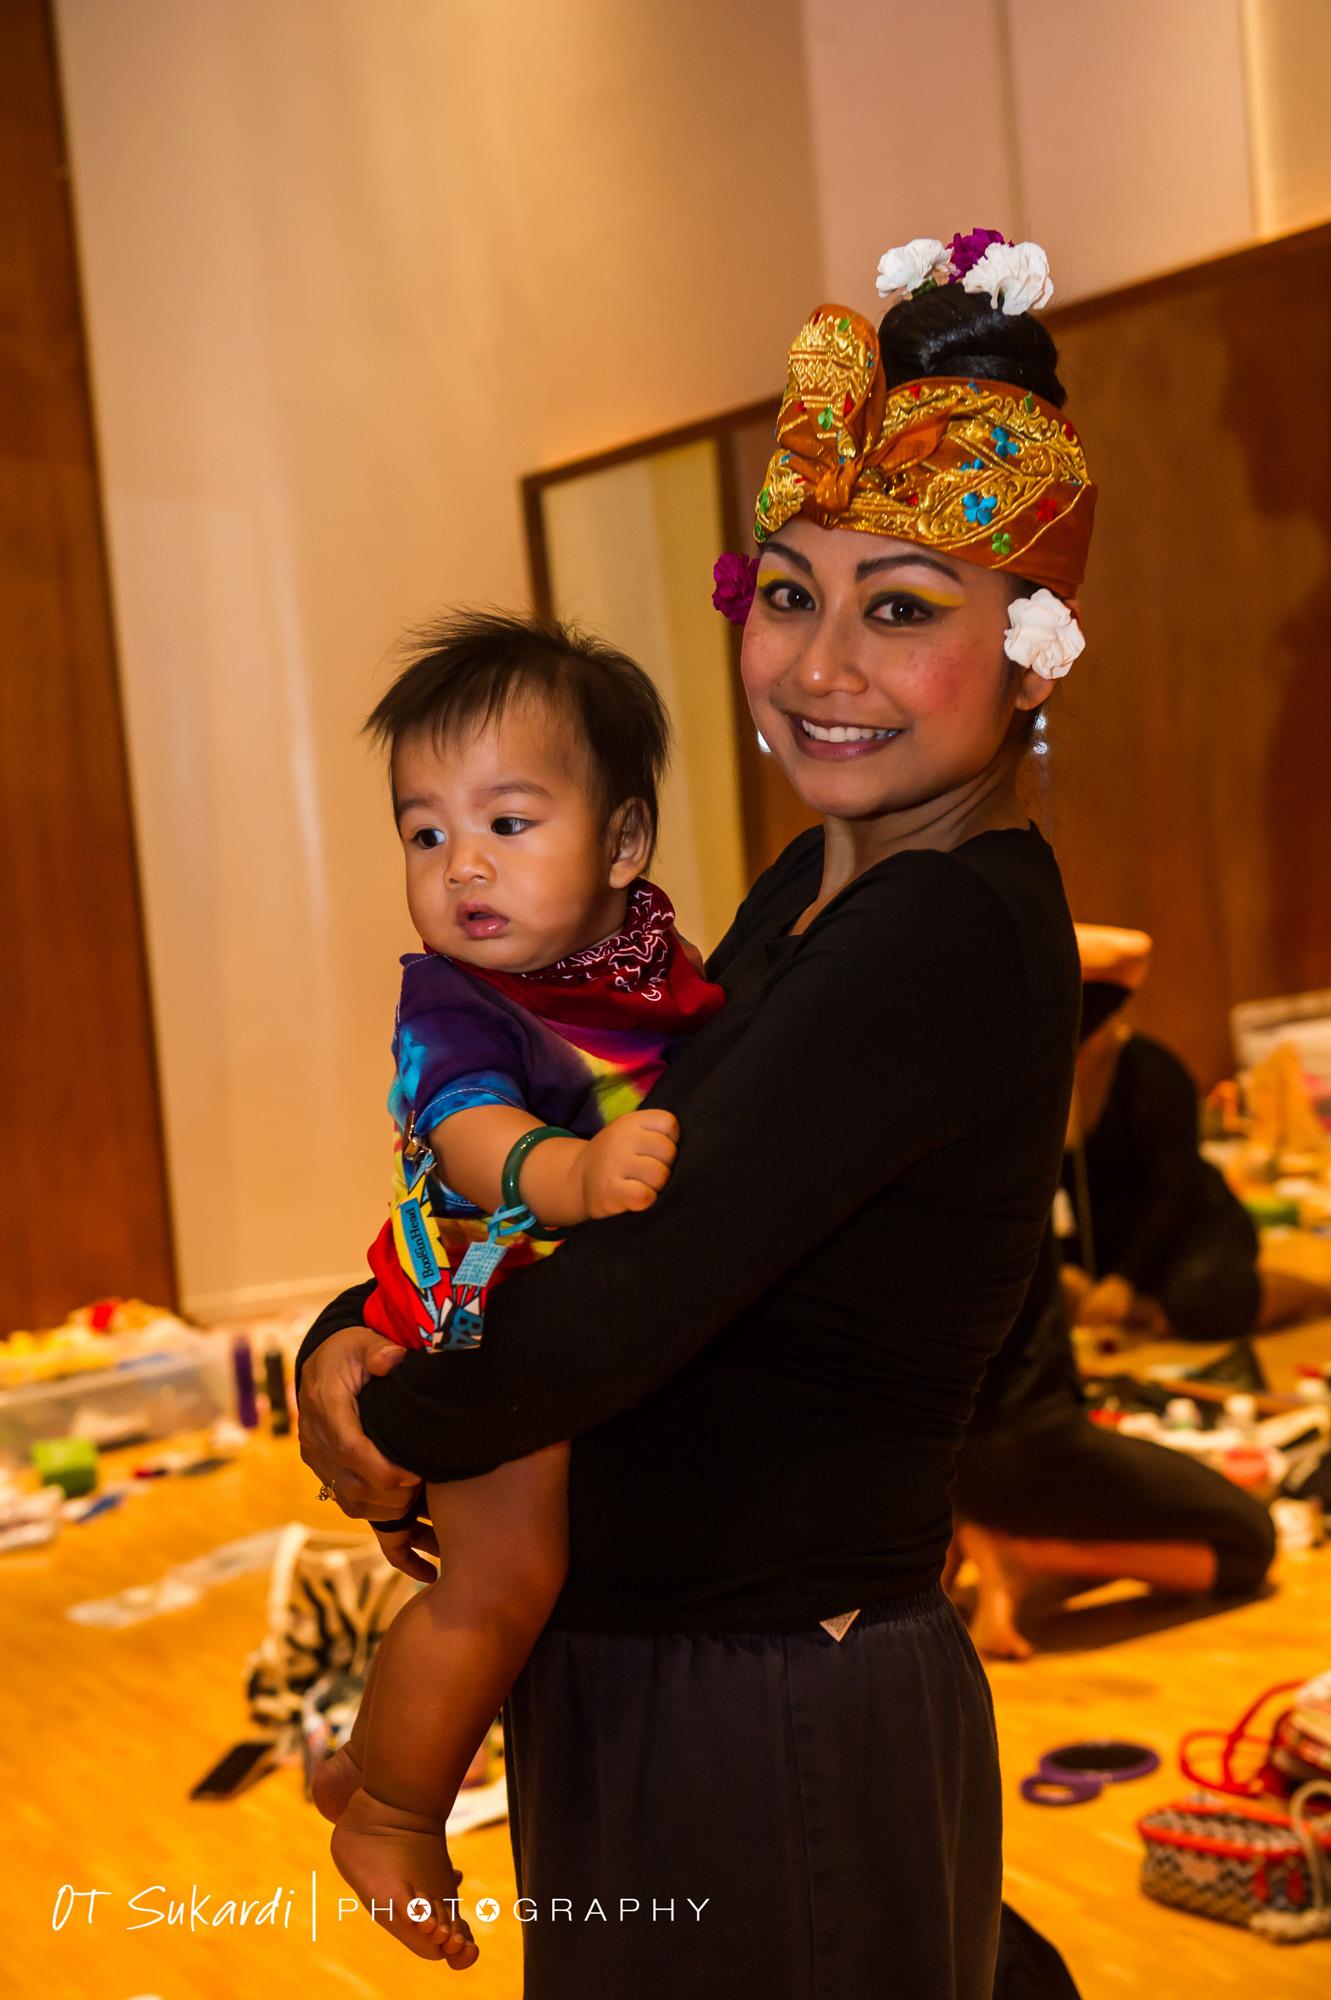 Female performer holds an infant